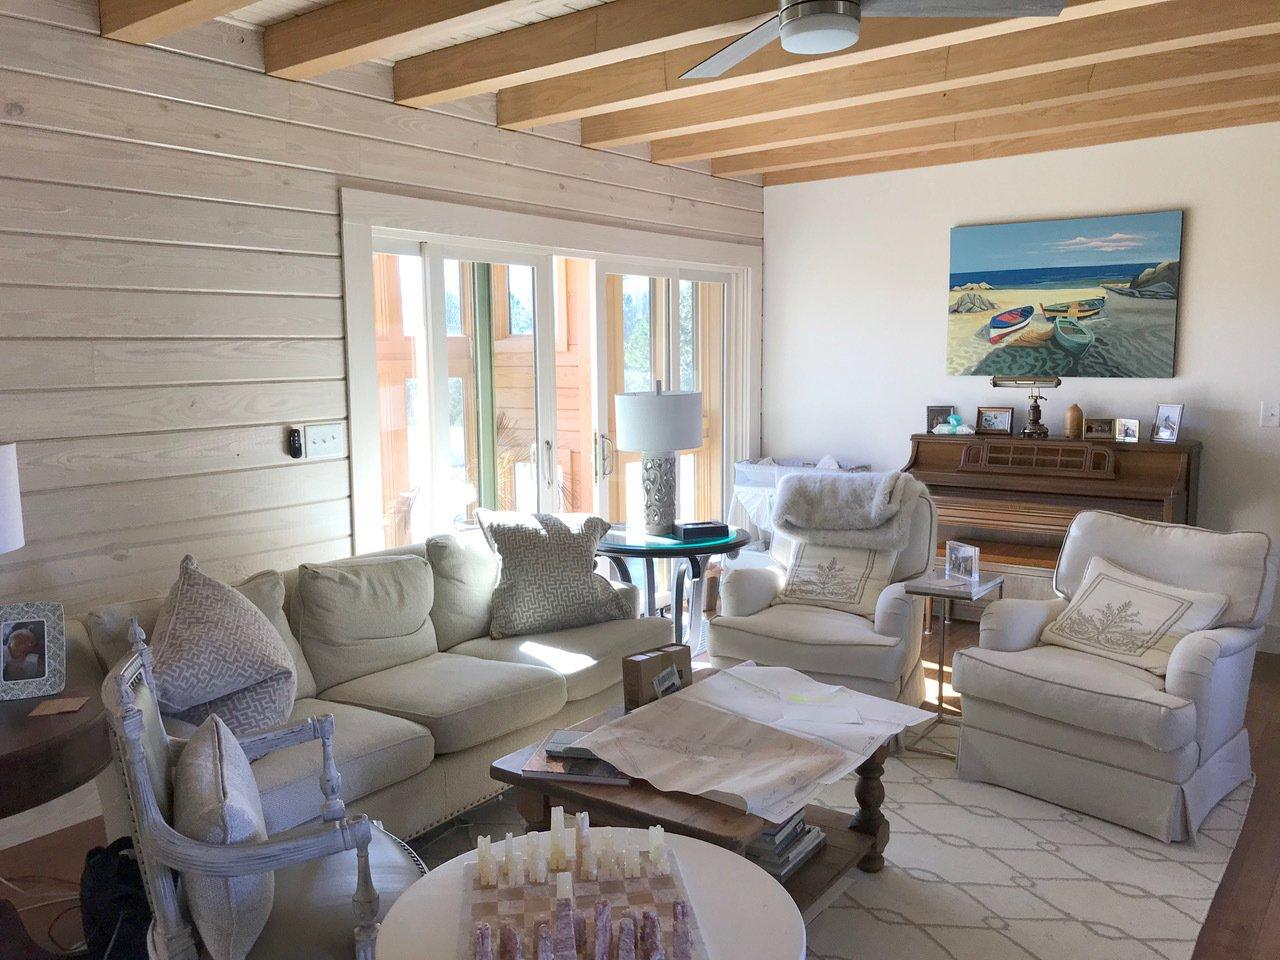 Living Room, Recliner, Ceiling Lighting, and Medium Hardwood Floor Living Room, Meridian by Enertia®  Meridian by Enertia Building Systems Inc.